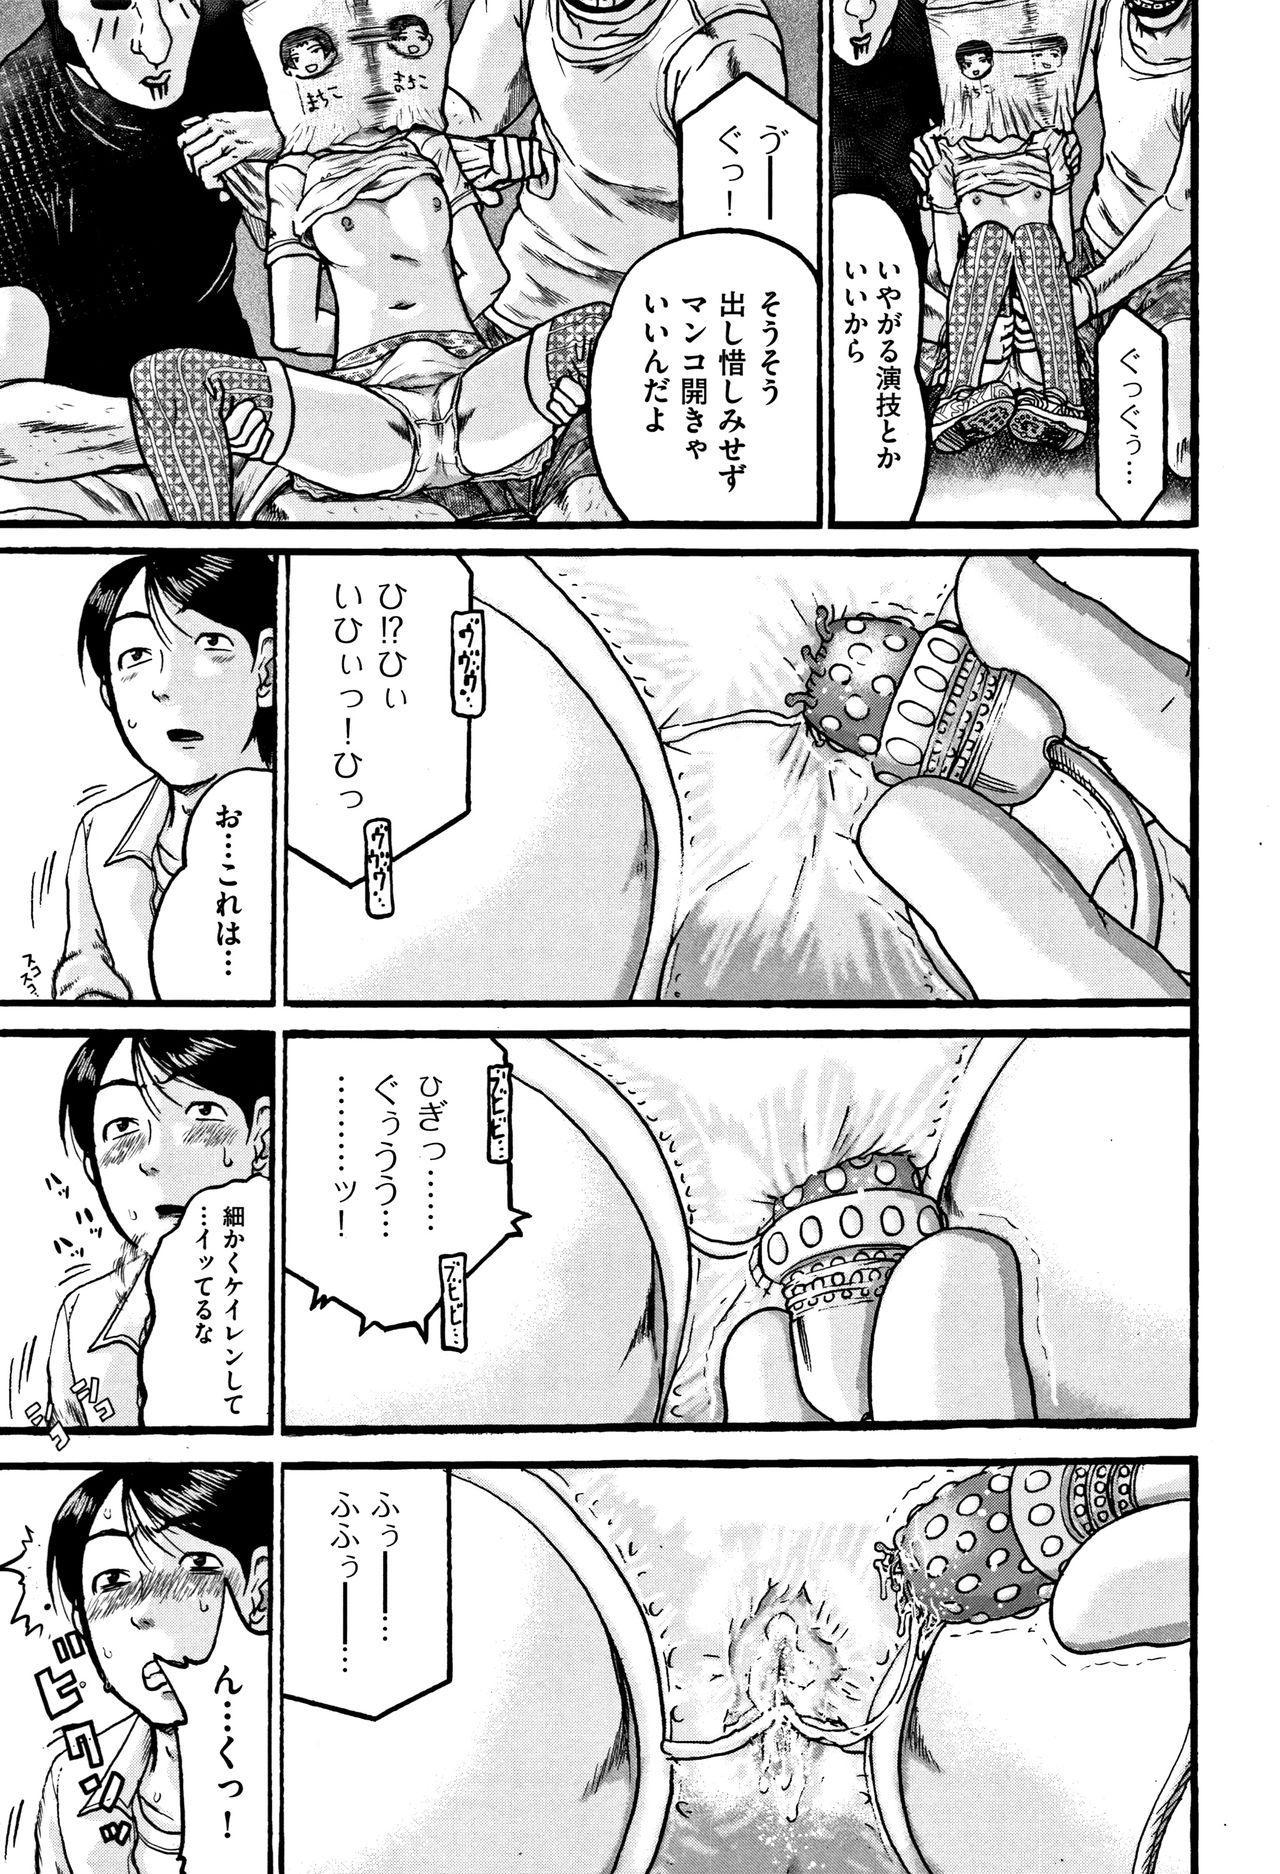 Shoujo Kumikyoku 5 32